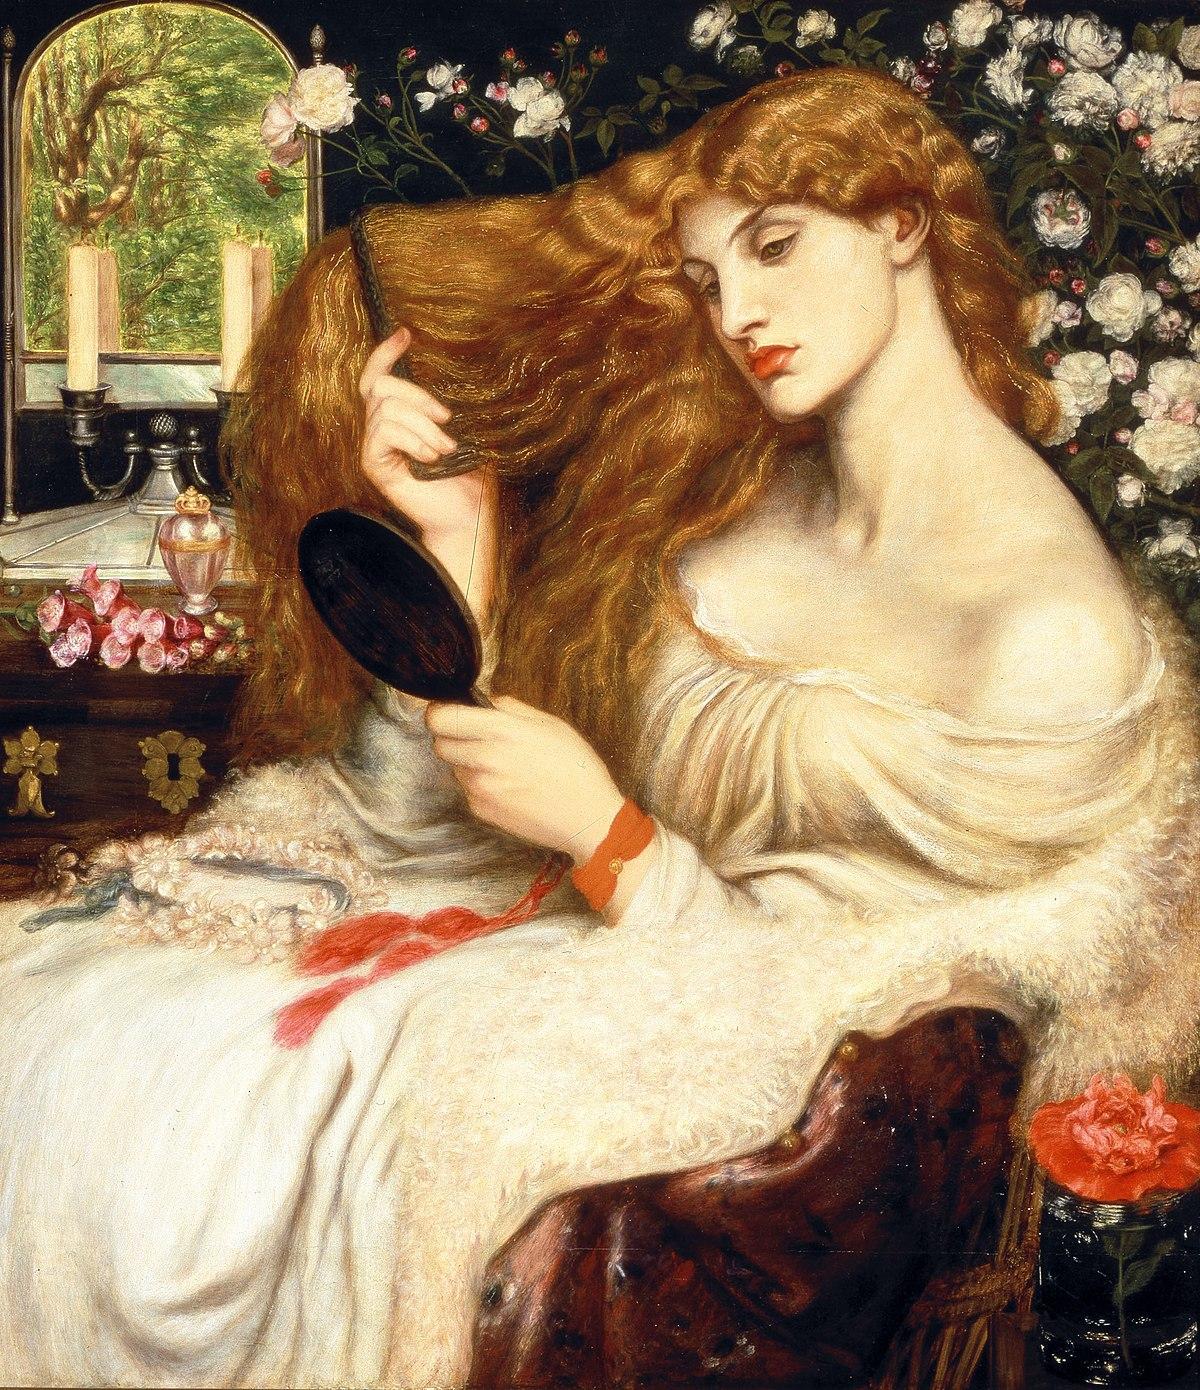 Hentai Vampire Girl regarding lilith — wikipédia